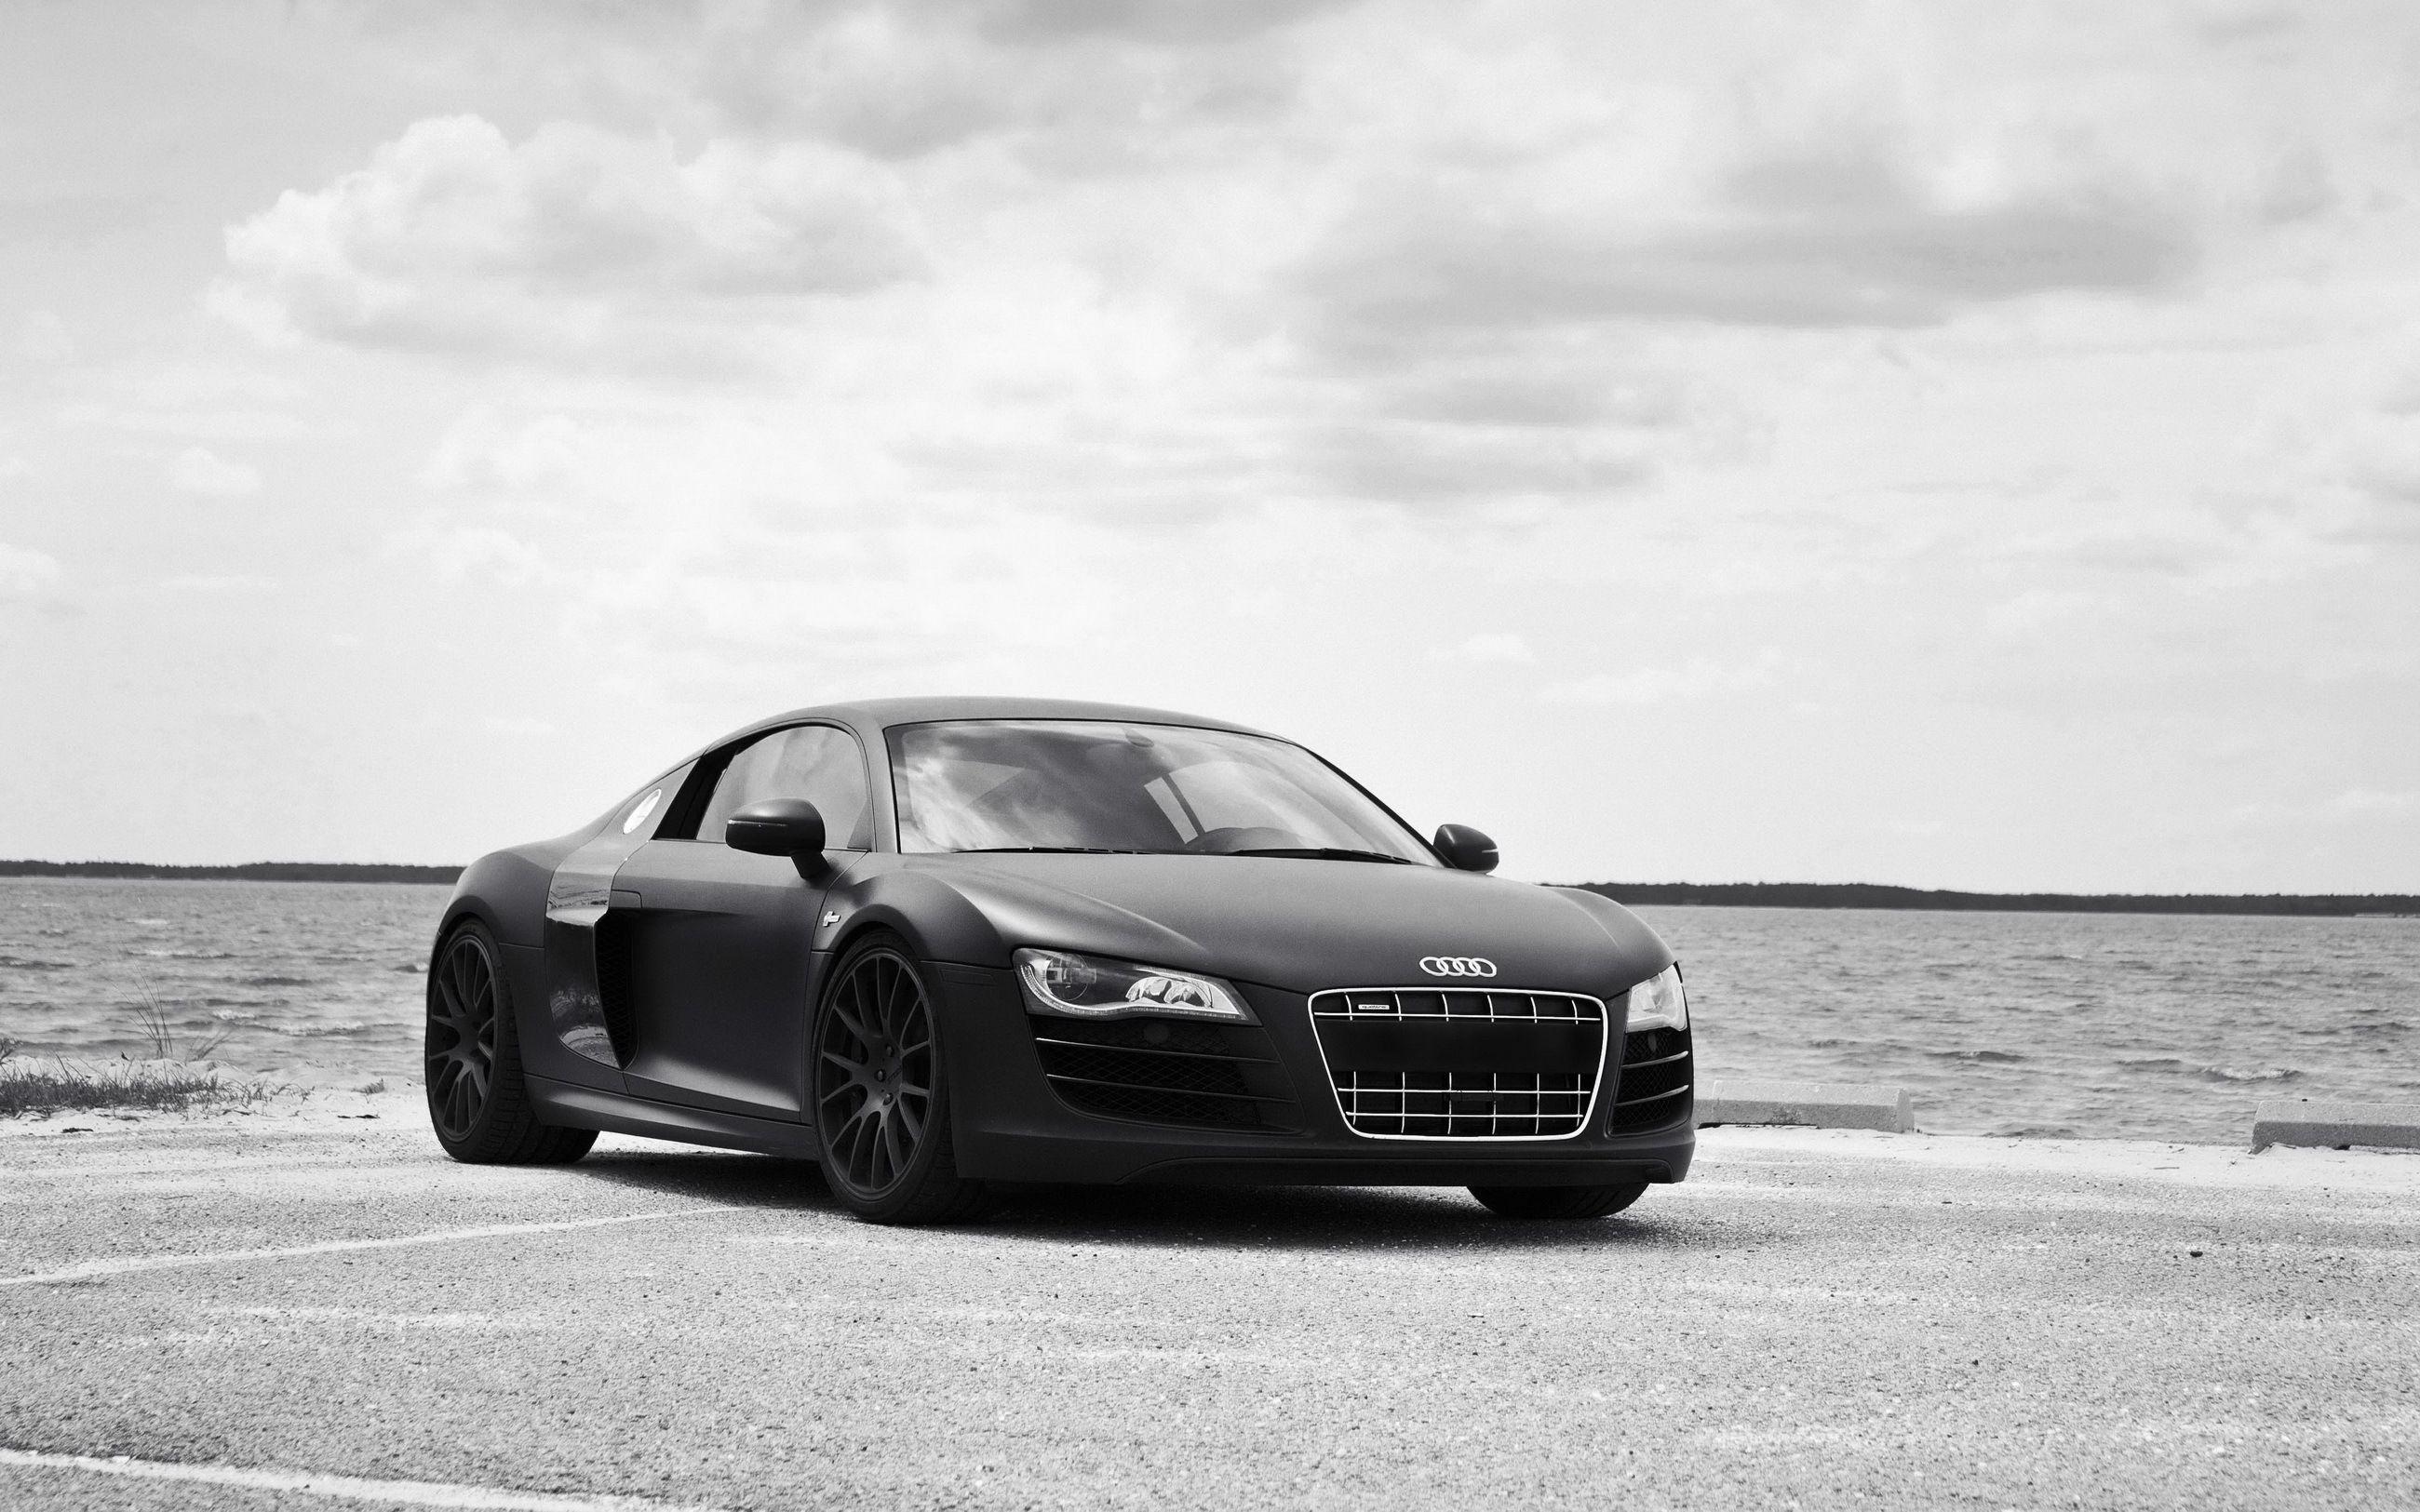 Audi R8 Black Cars Wallpaper Wallpaper Trends Black Audi Audi R8 Black Audi R8 Matte Black